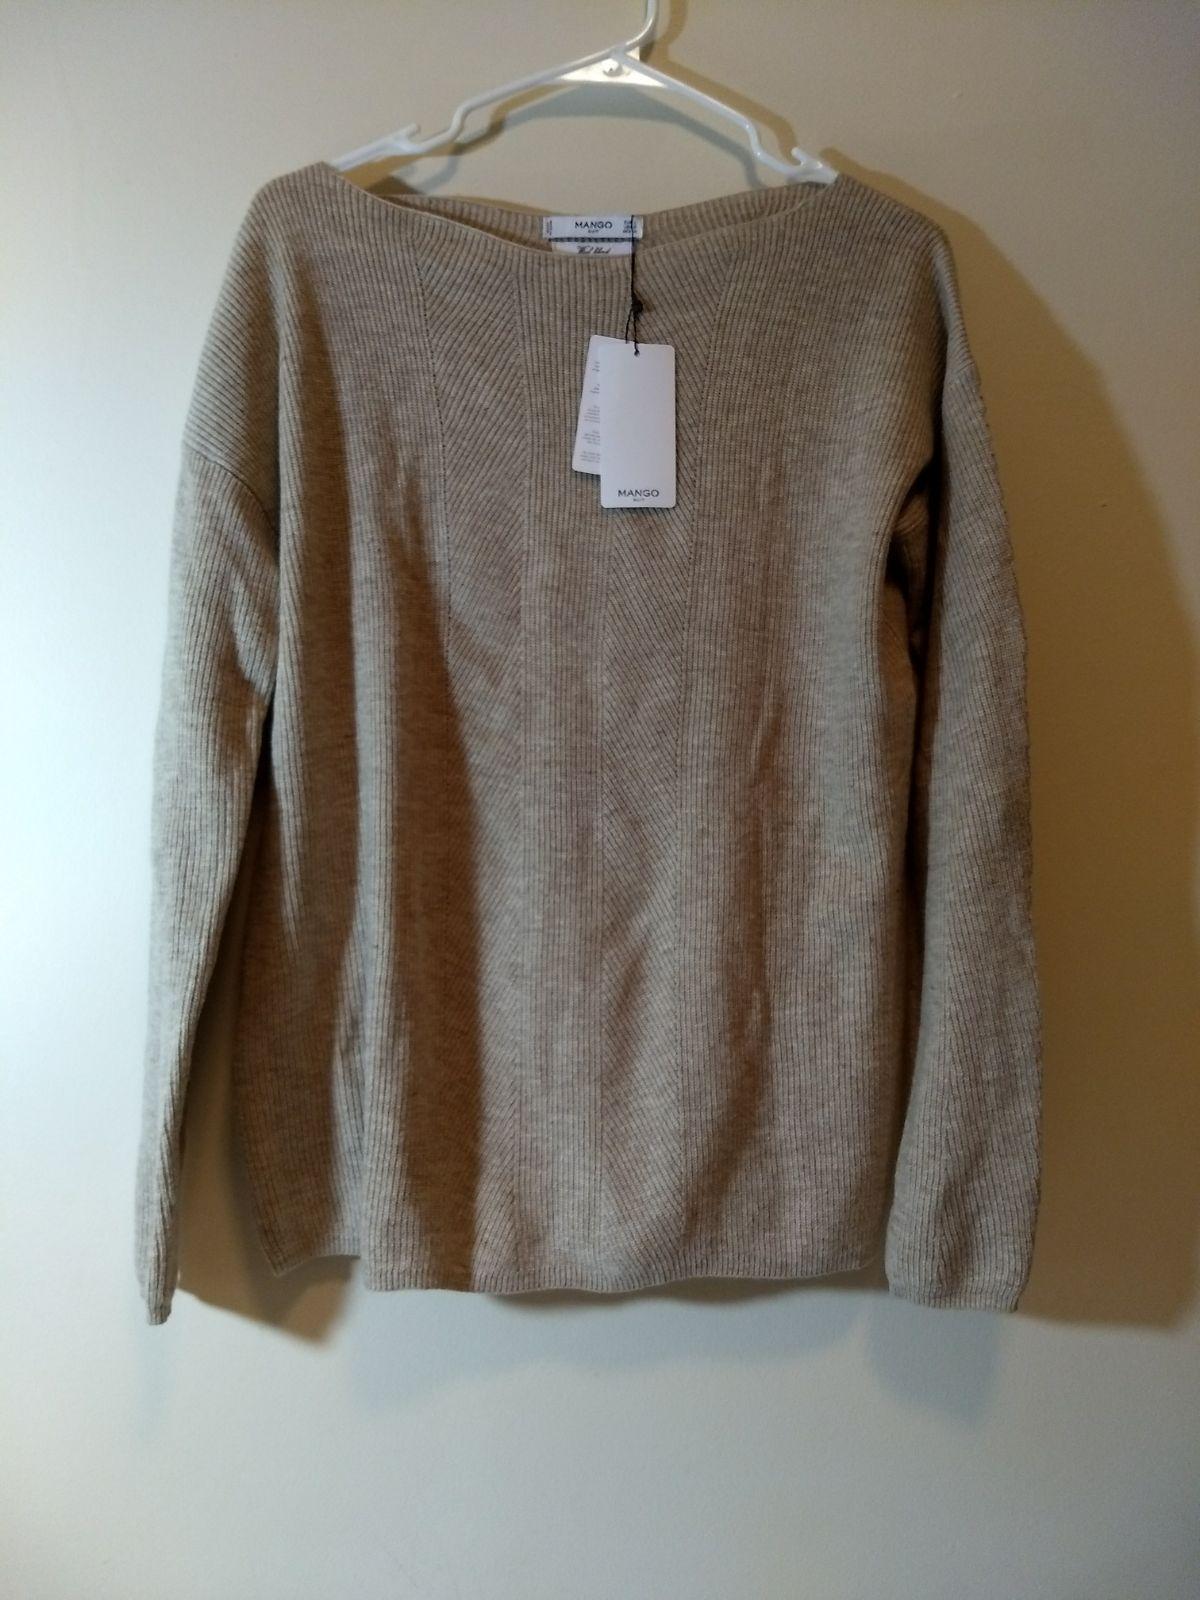 Ribbed wool sweater in light tan/grey - Mercari: BUY & SELL THINGS ...